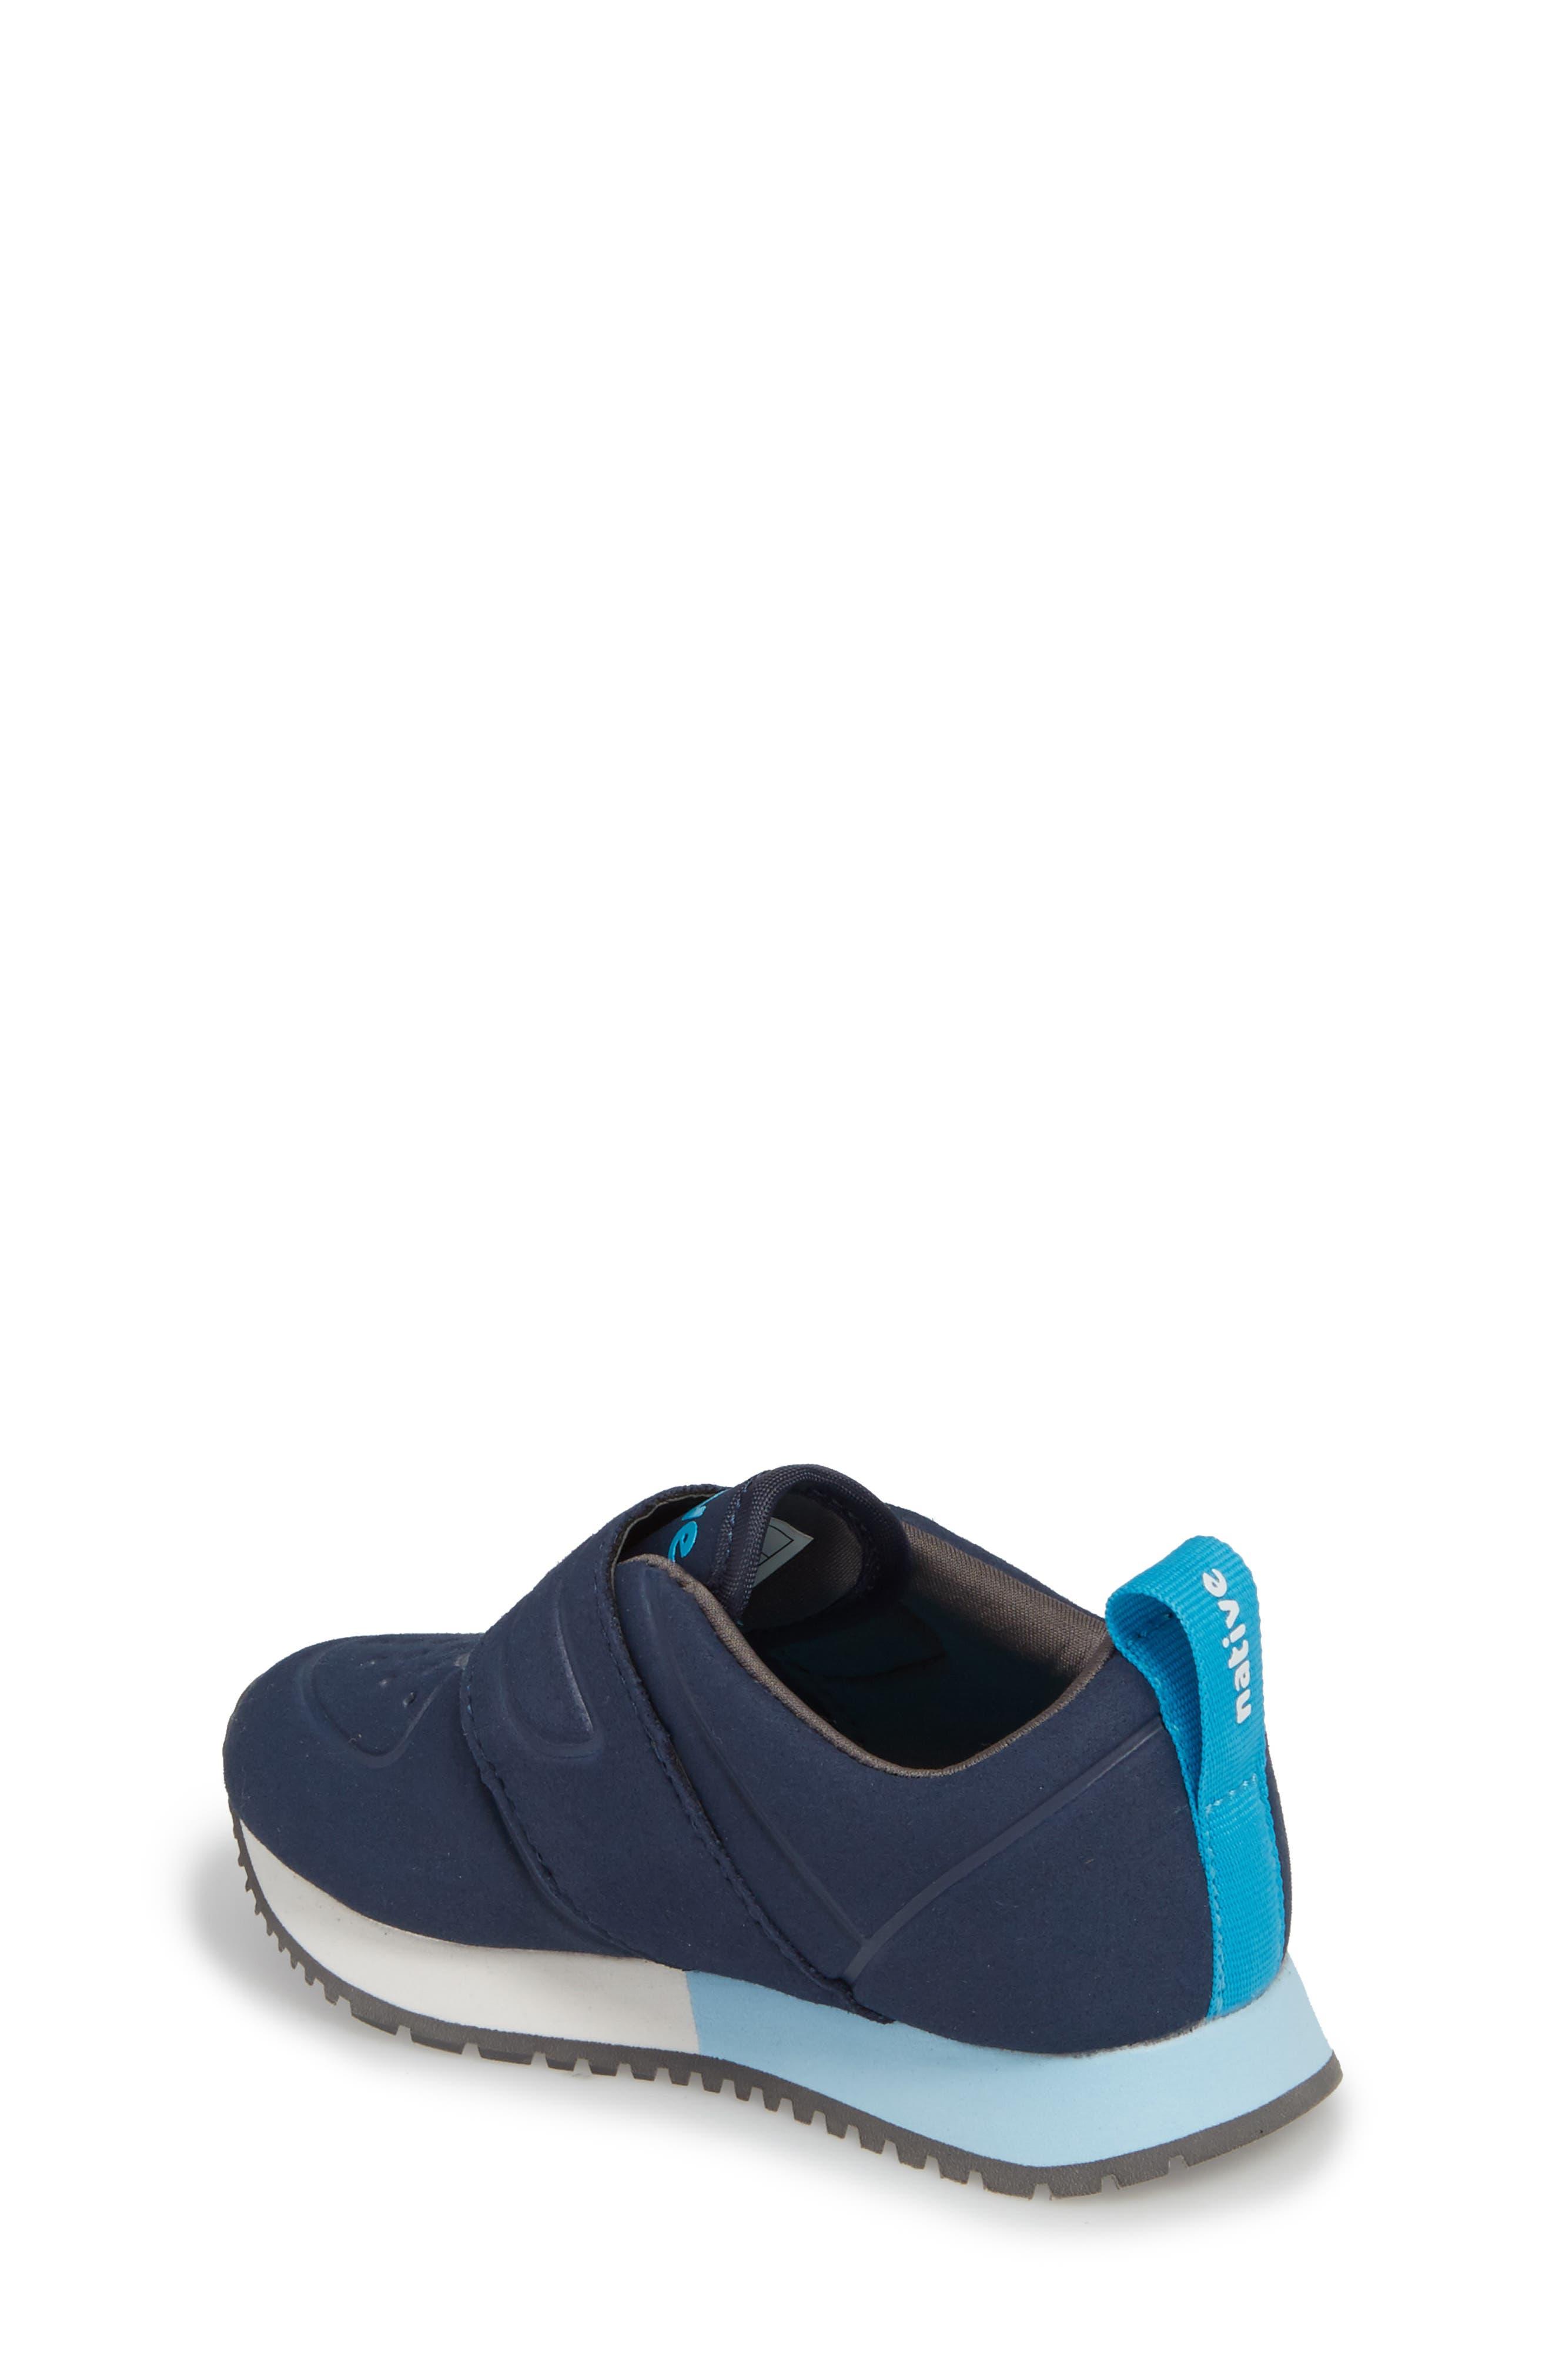 Native Cornell Perforated Sneaker,                             Alternate thumbnail 2, color,                             REGATTA BLUE/ SHELL WHITE